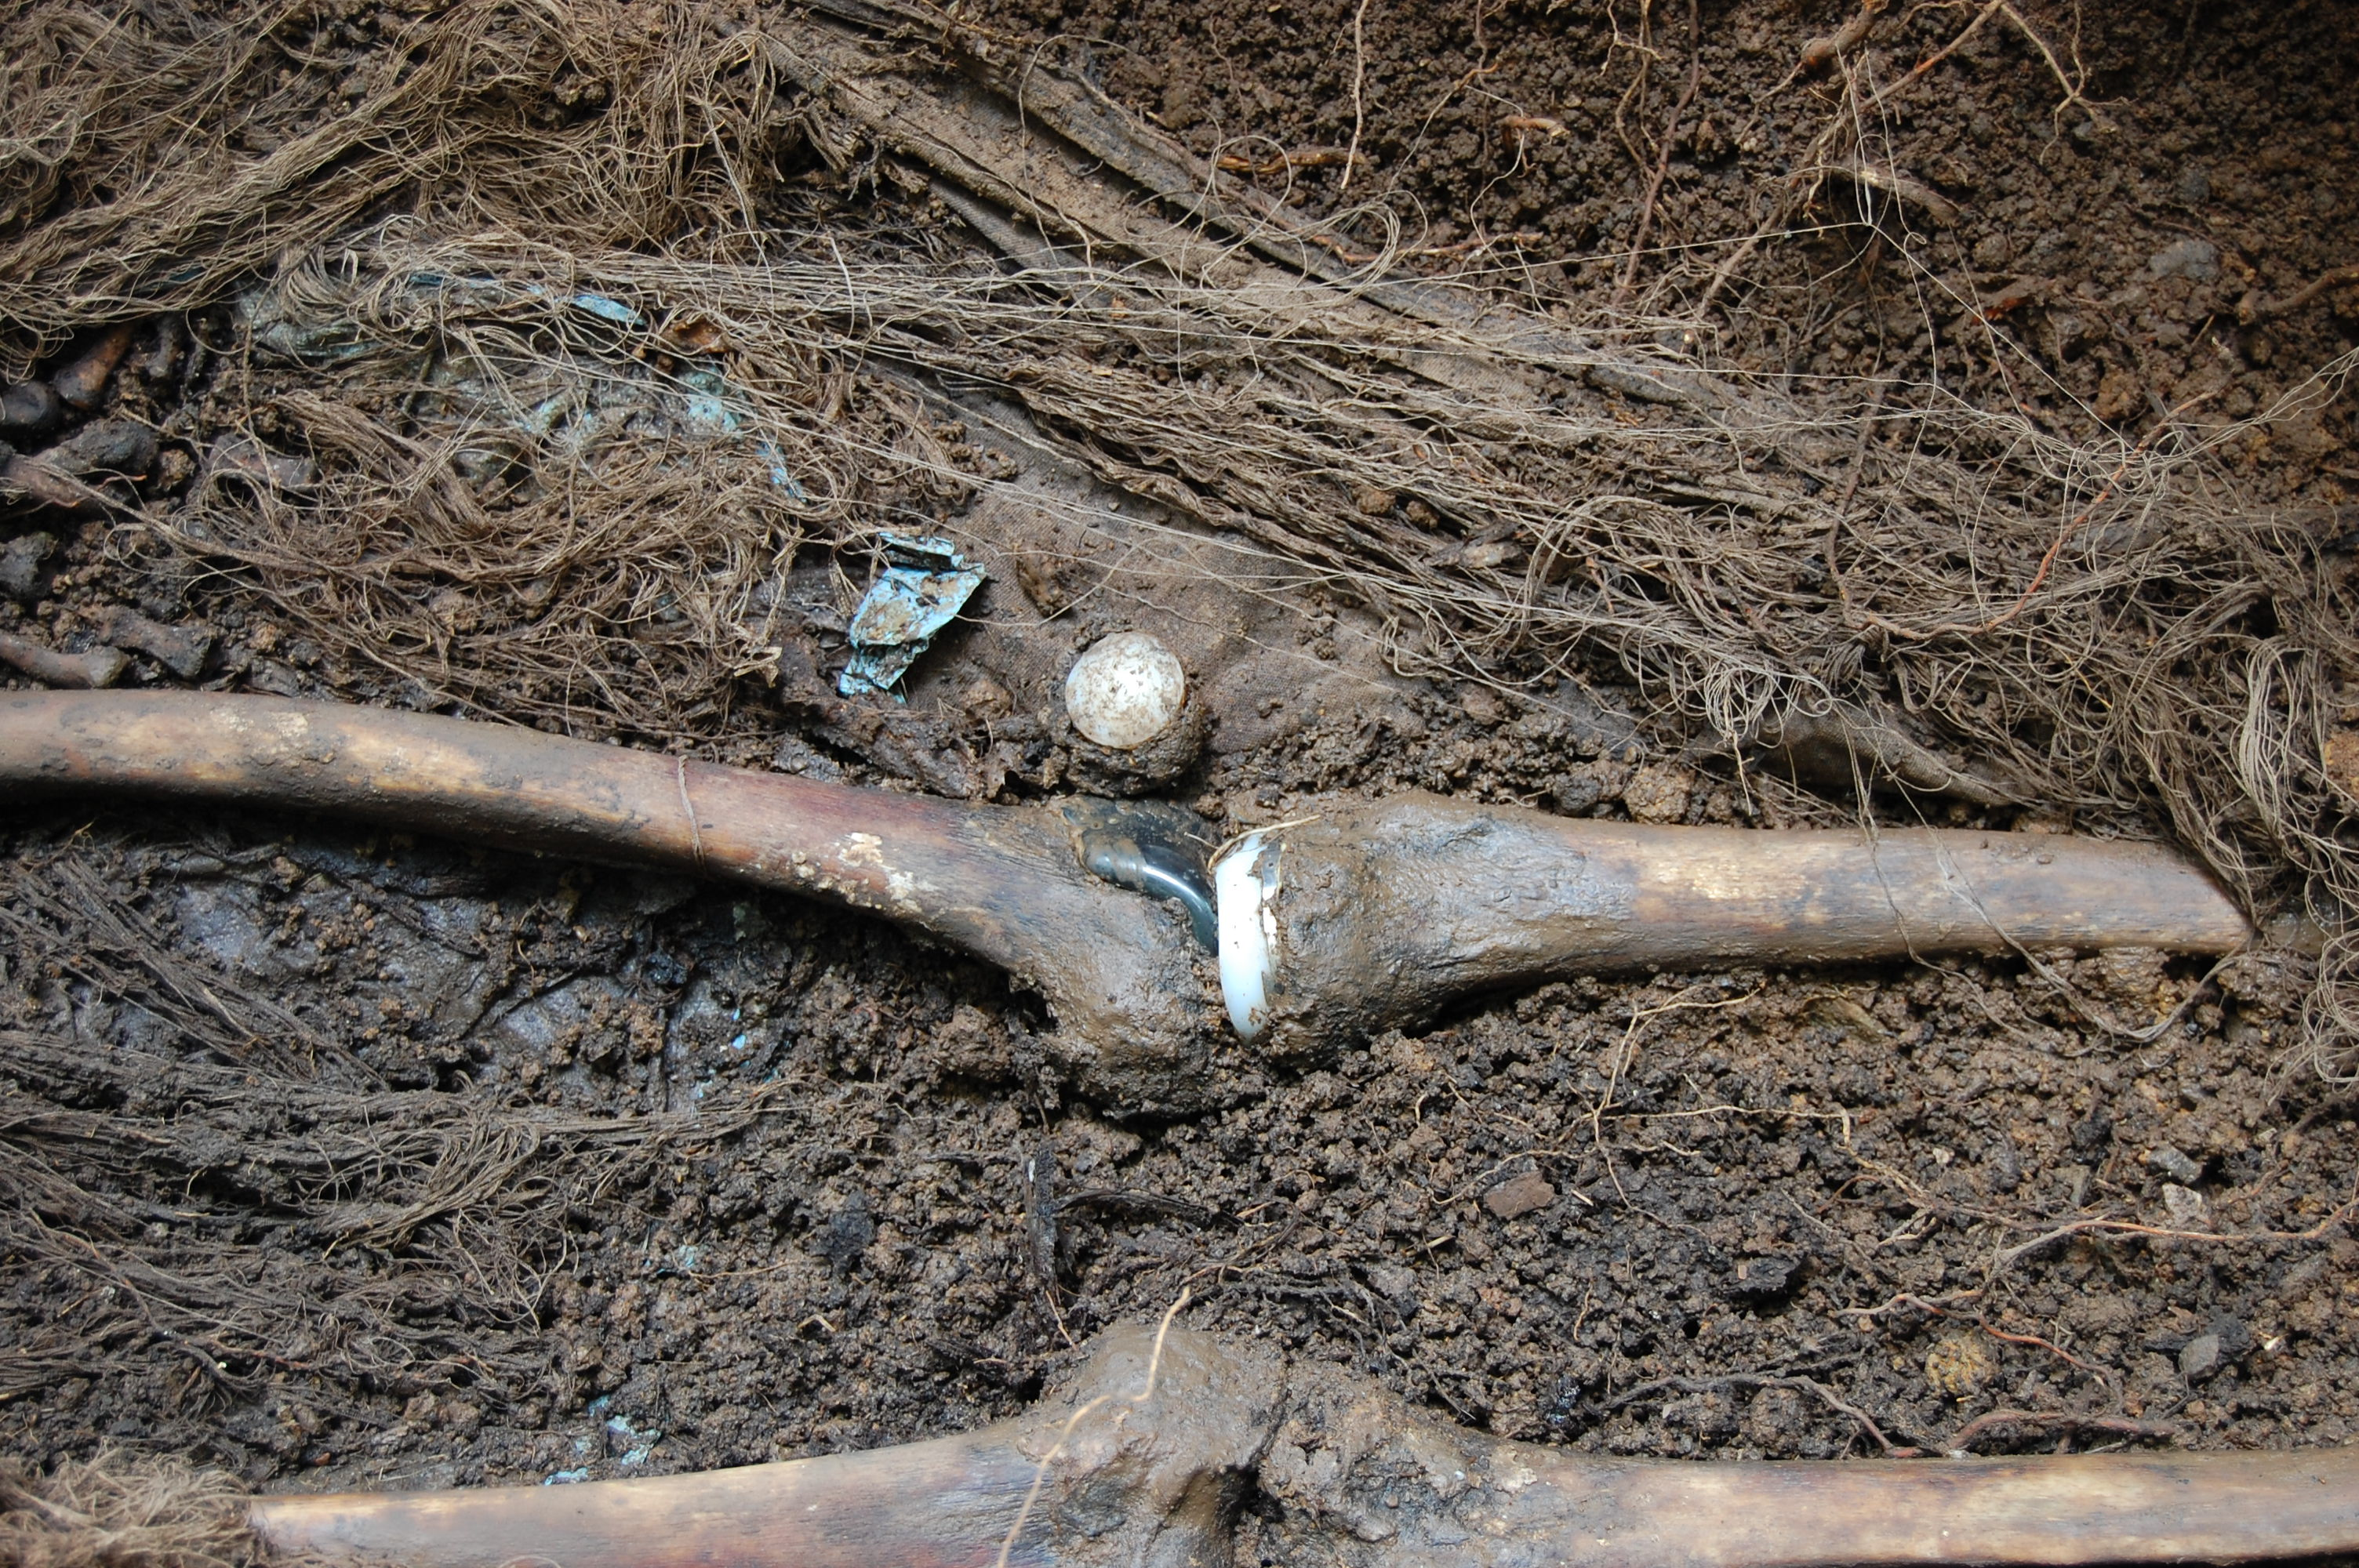 Artifical knee on cadaver